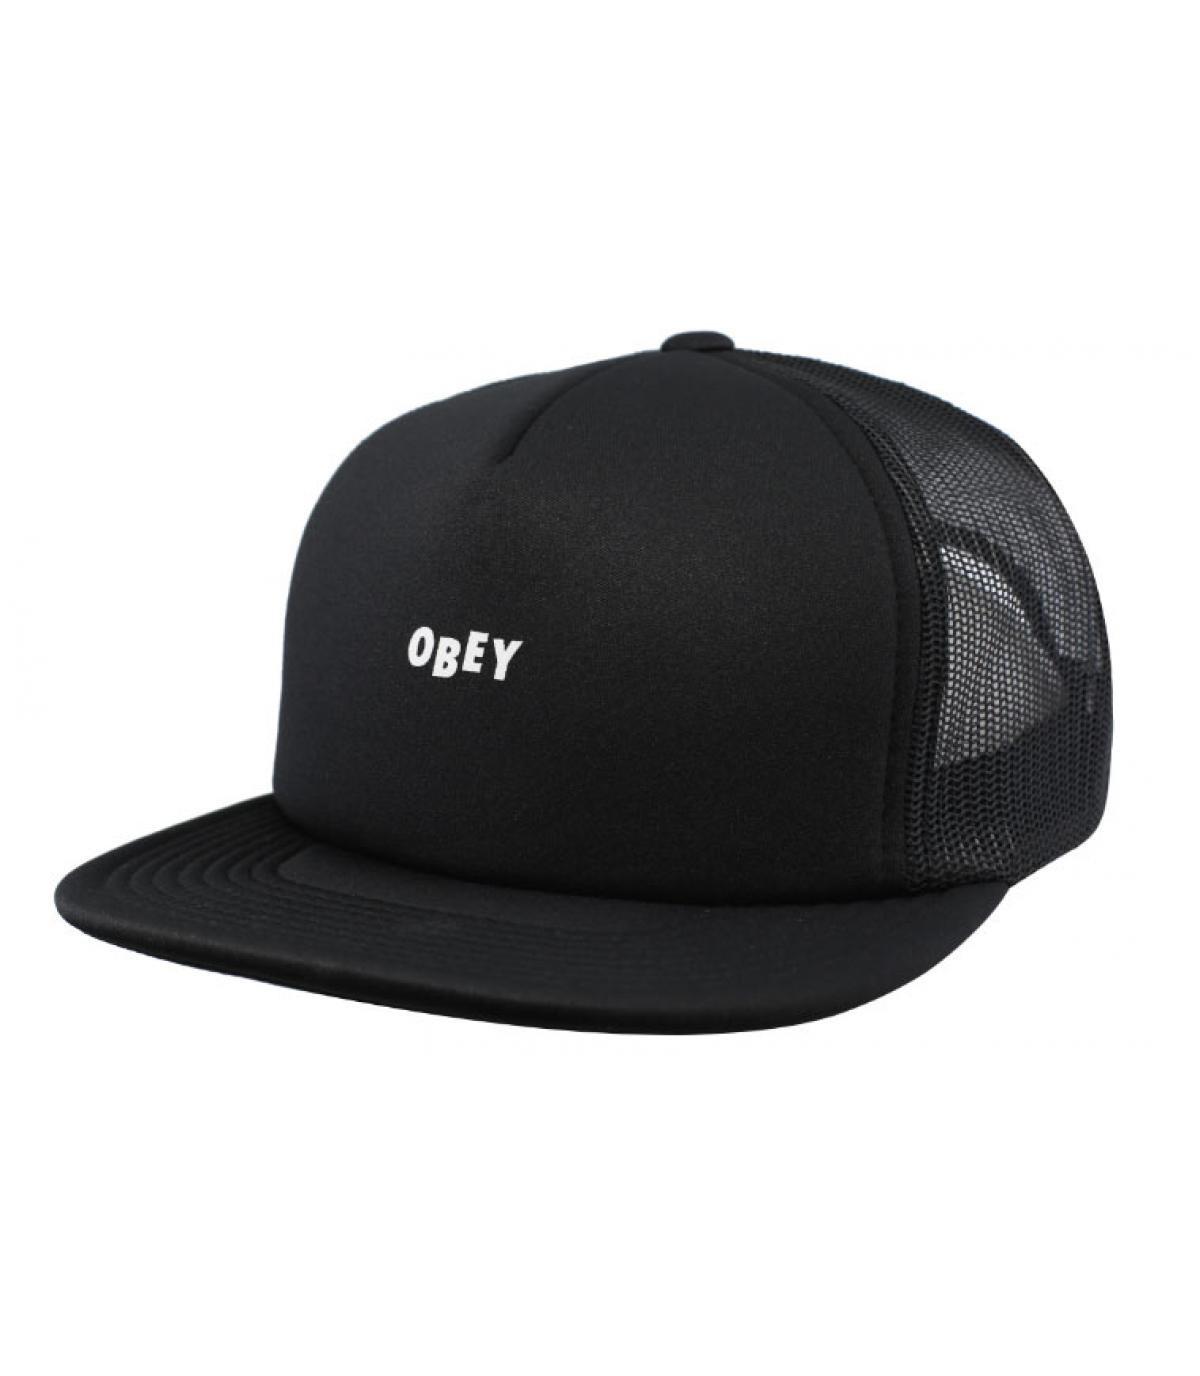 black Obey trucker - Trucker Jumble Bar black by Obey. Headict cf229d7b82d